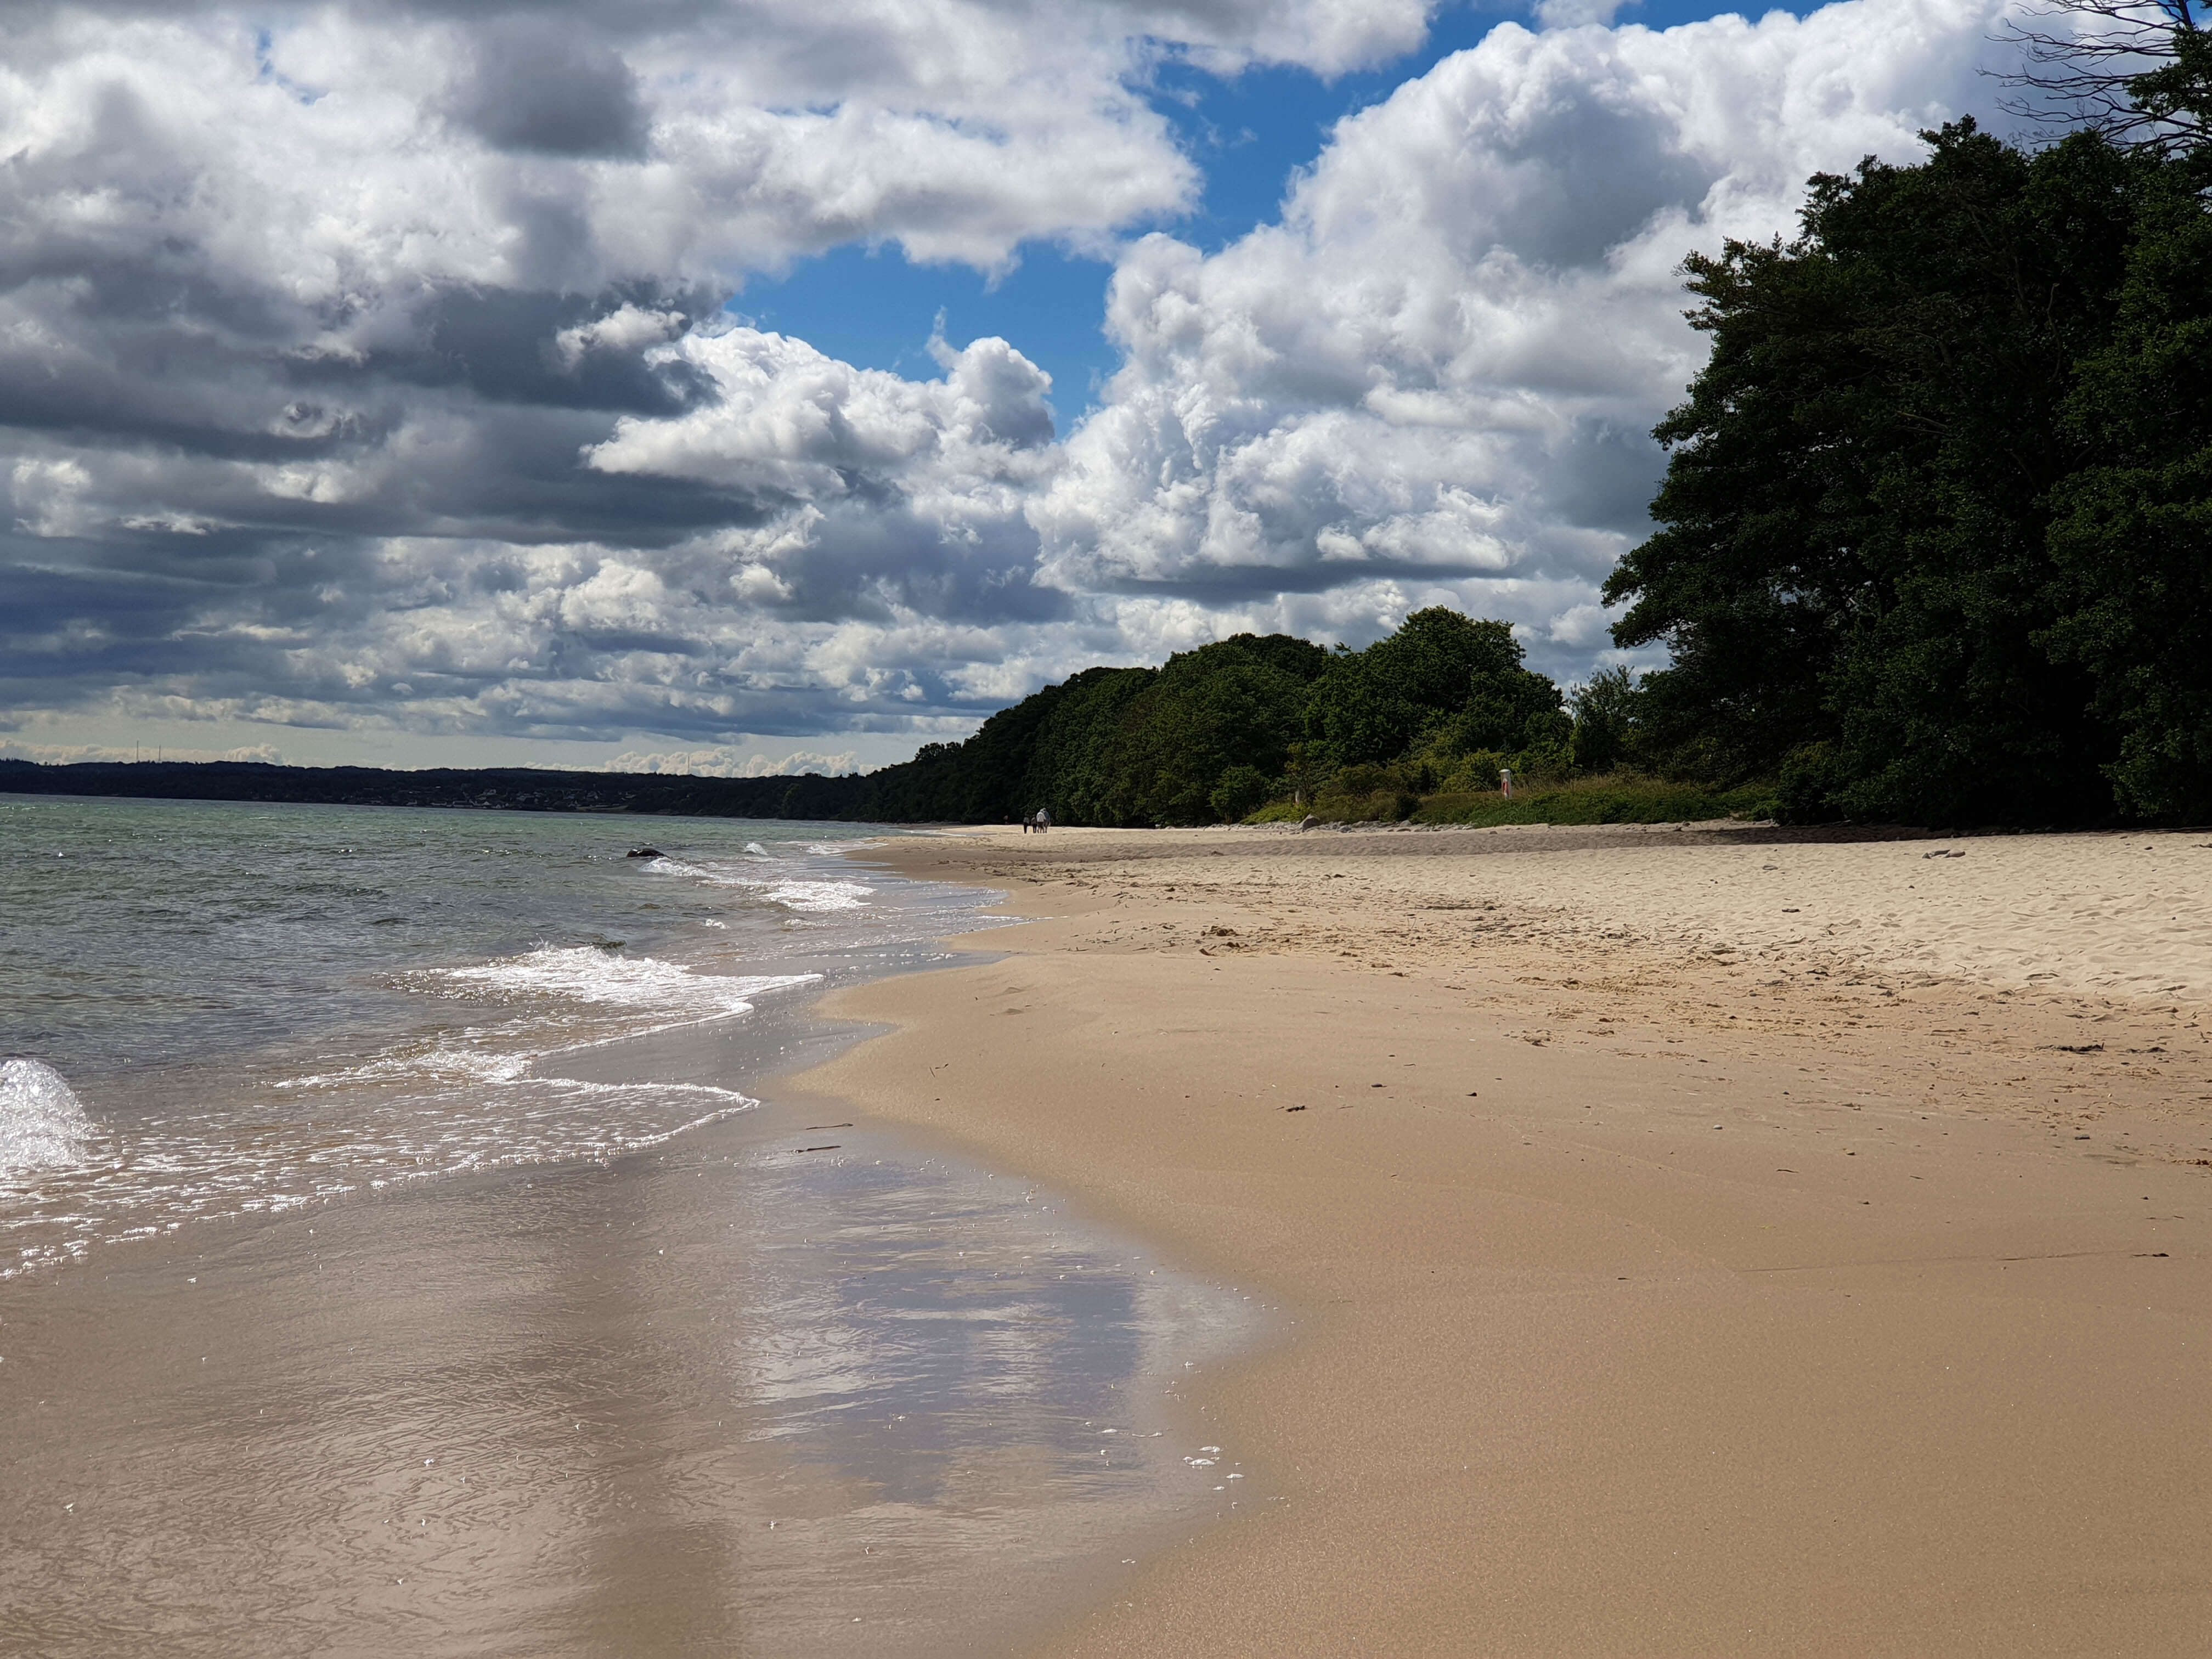 Mooiste stranden in Zuid Zweden